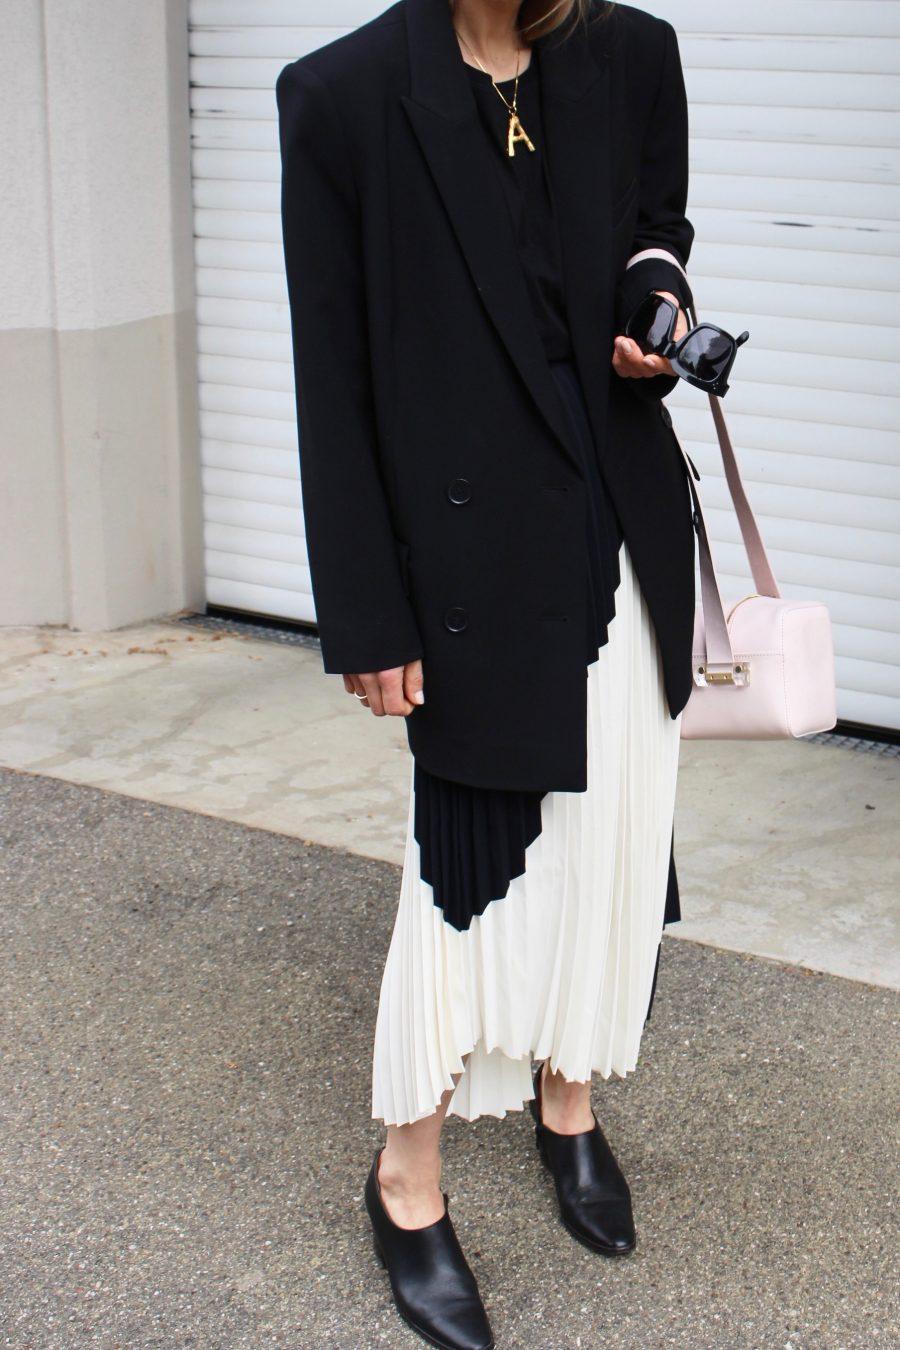 Skirt H&M Trend summer 2018